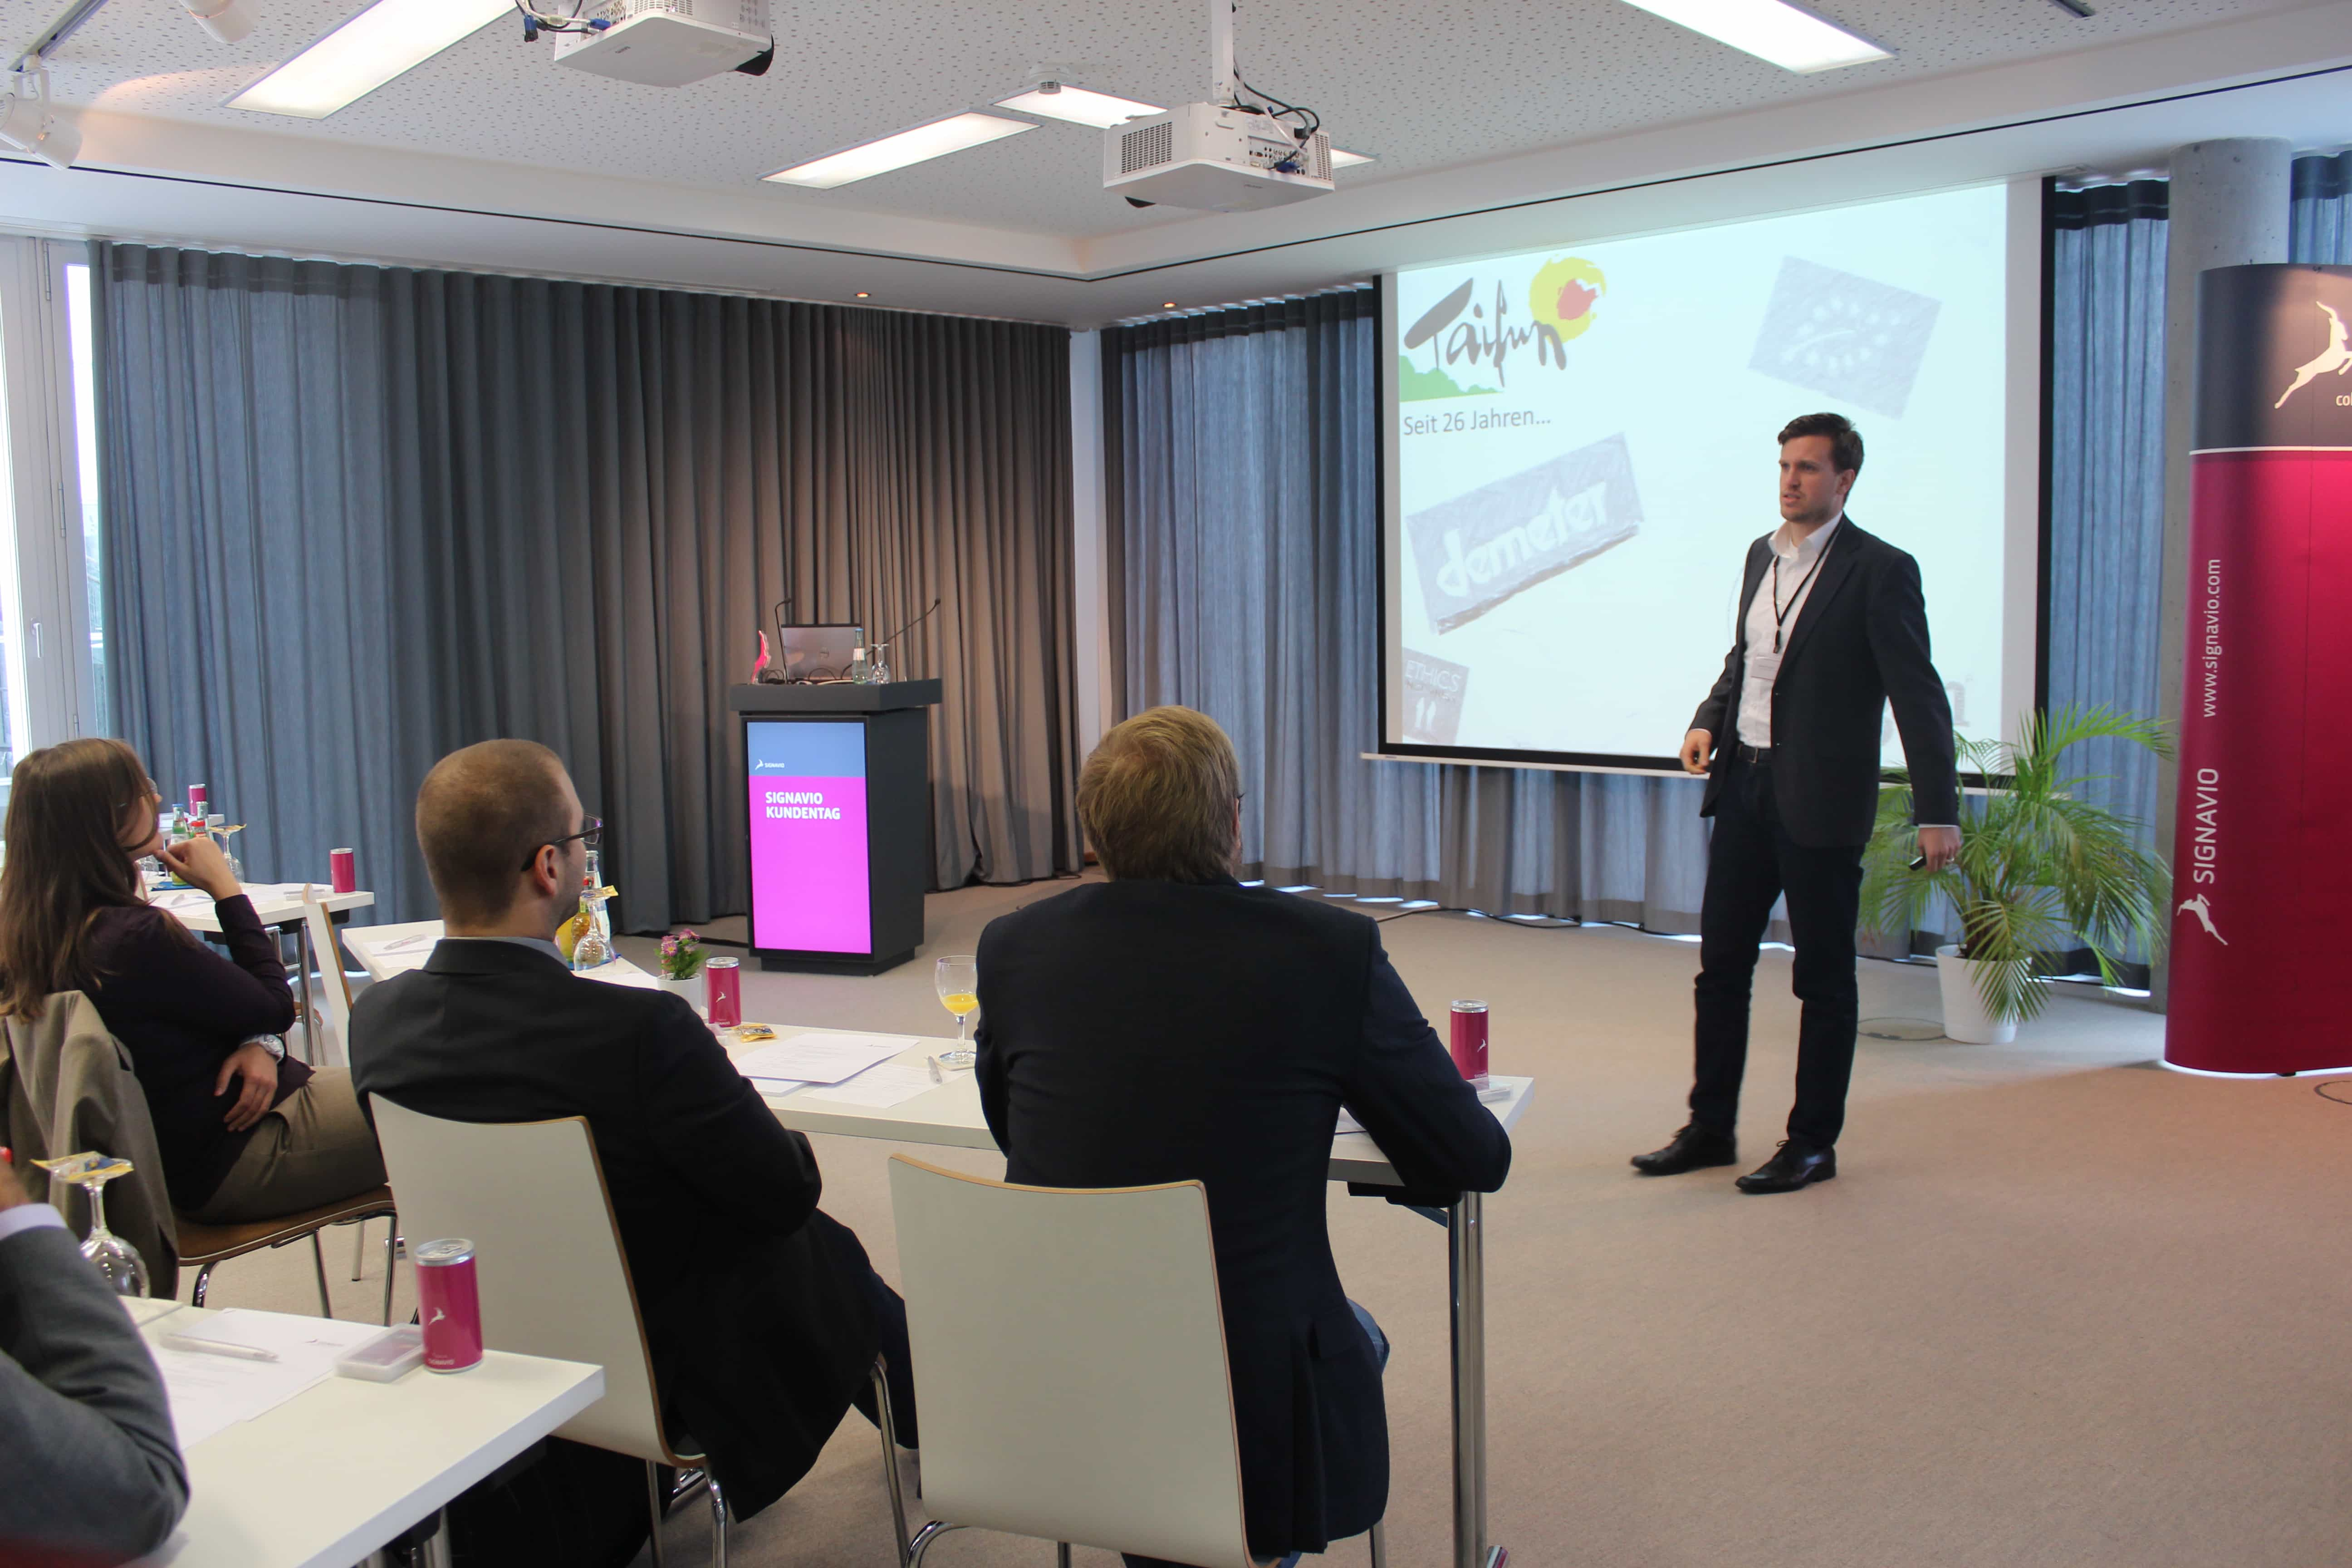 Presentation at the 3rd Signavio Customer Day in Berlin